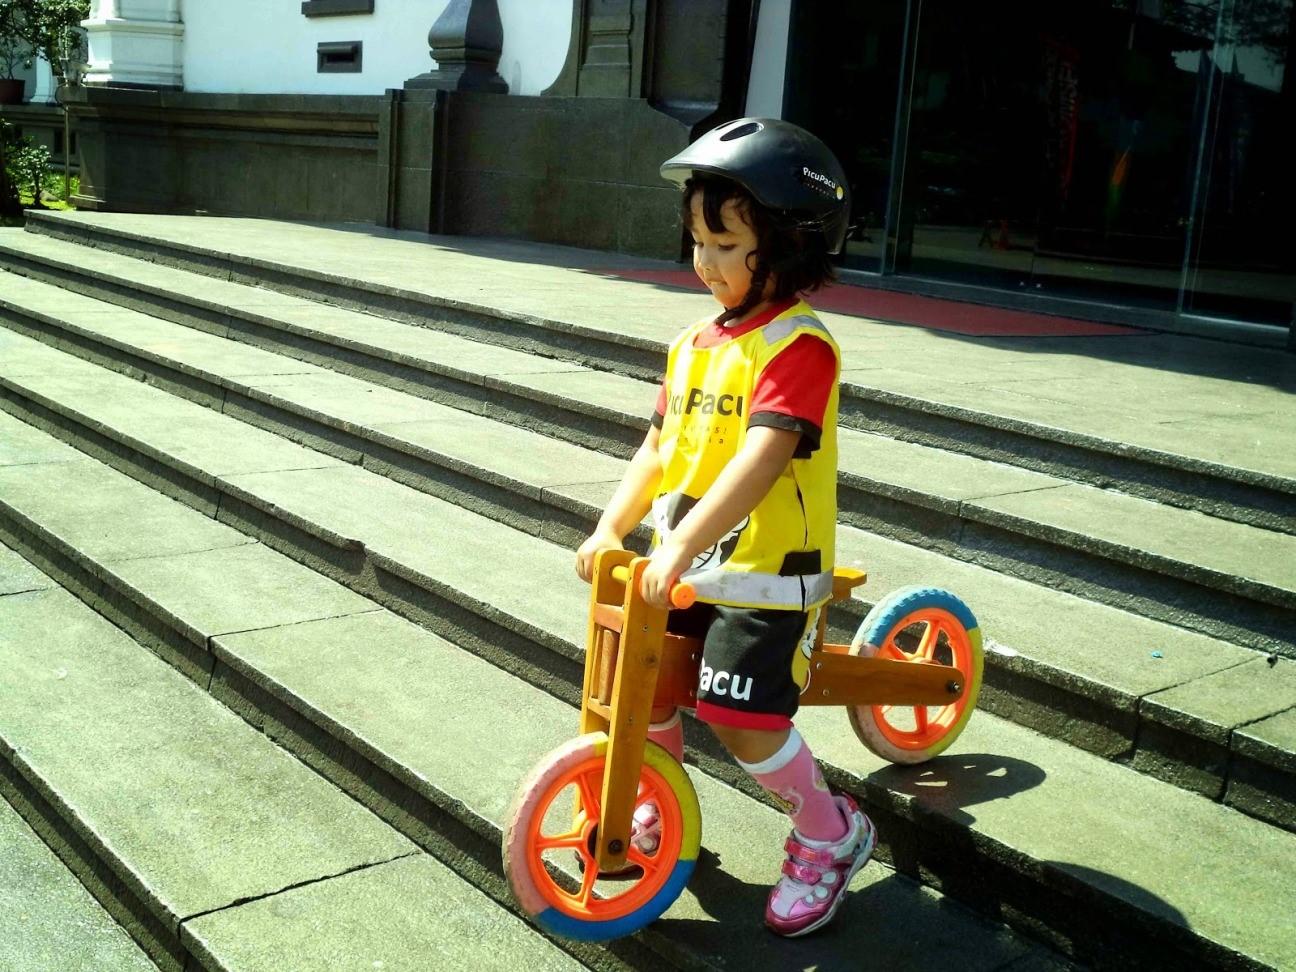 5 Perlengkapan yang Wajib Dipakai Si Kecil Saat Main Sepeda